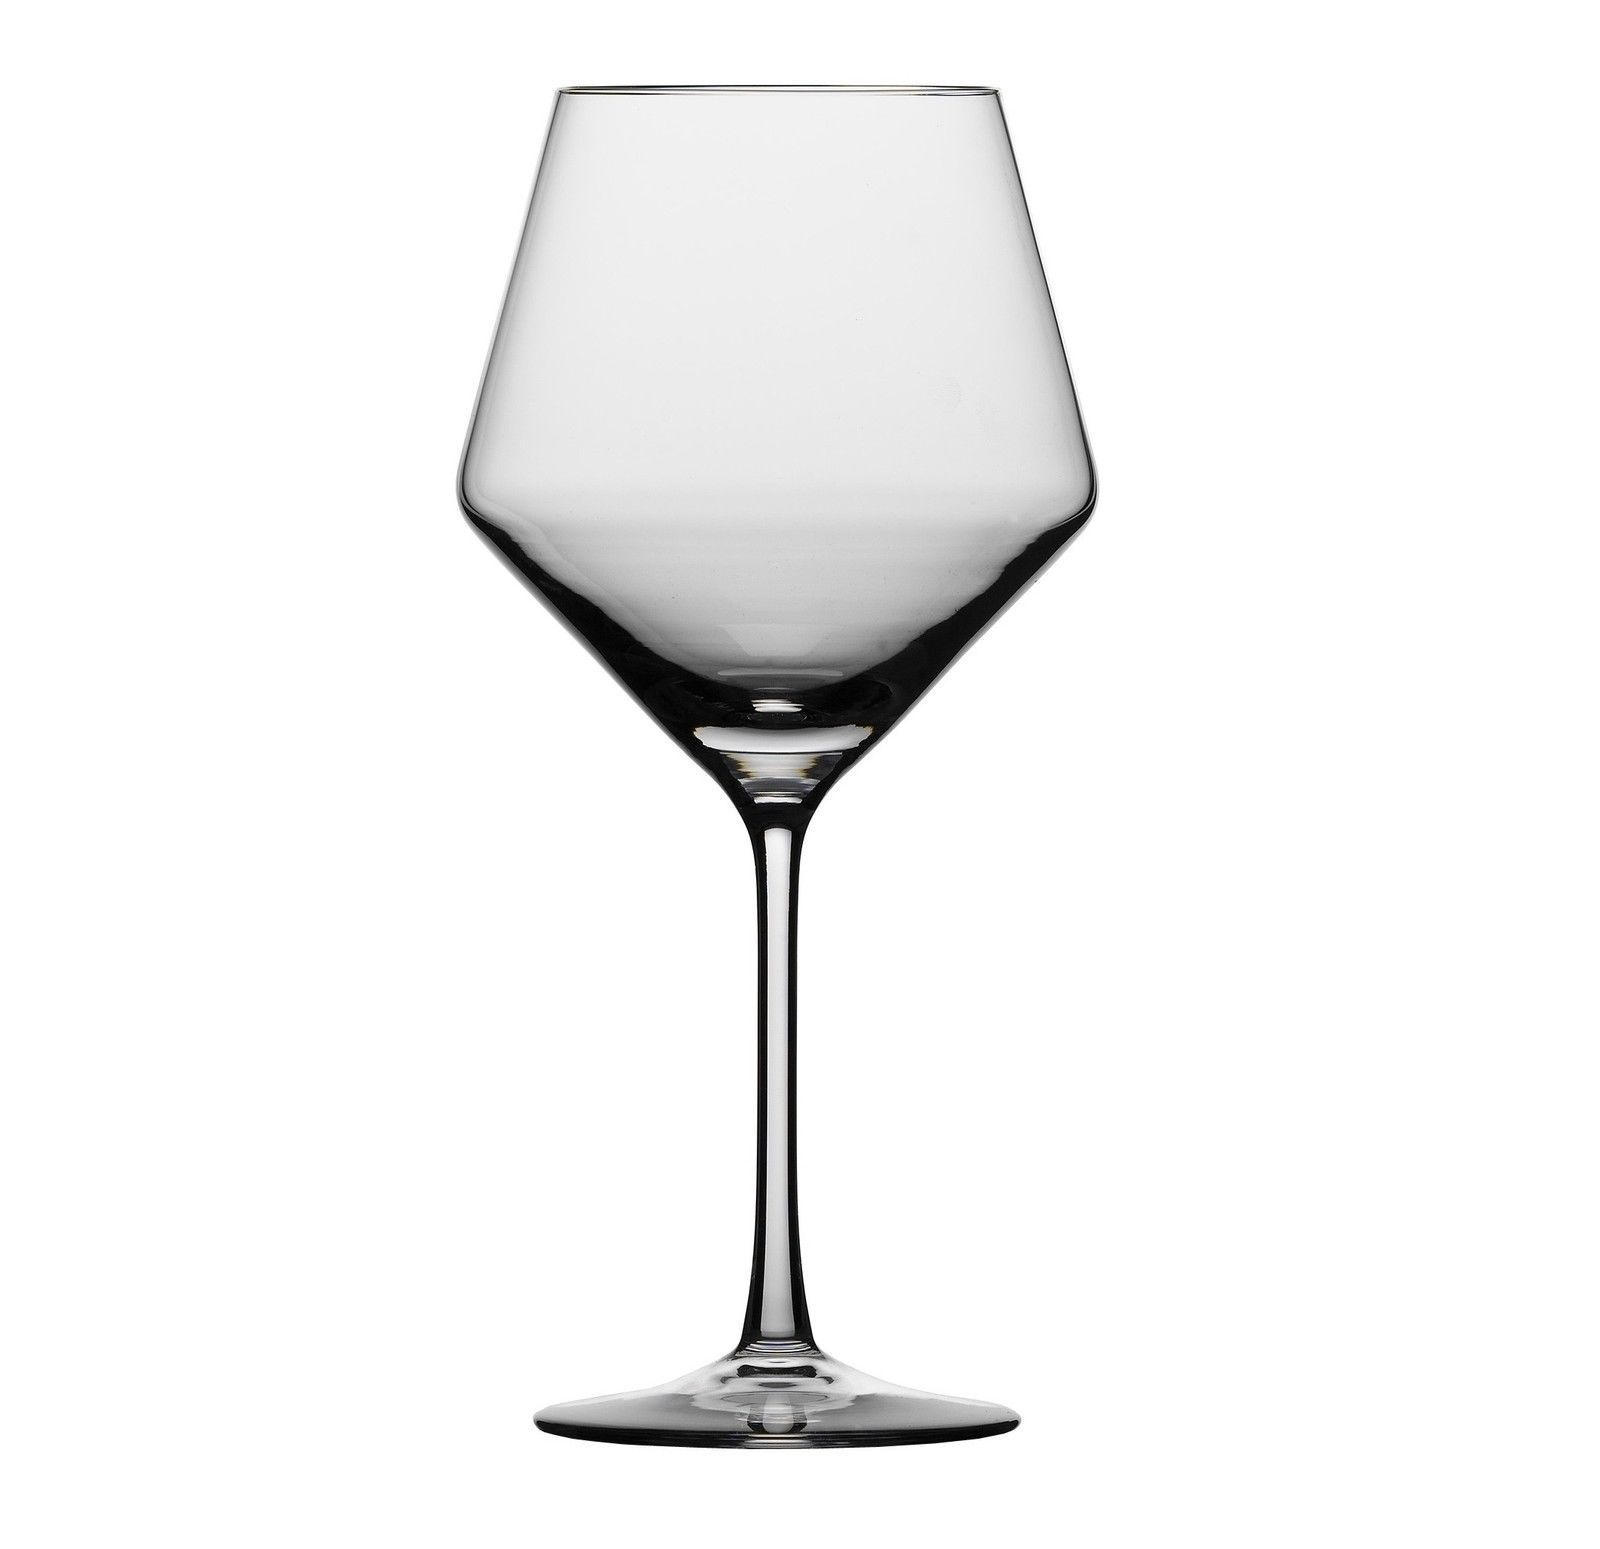 Набор бокал для красного вина Schott Zwiesel PURE, объем 0,692 л, прозрачный, 6 штук Schott Zwiesel 112421_6шт фото 1